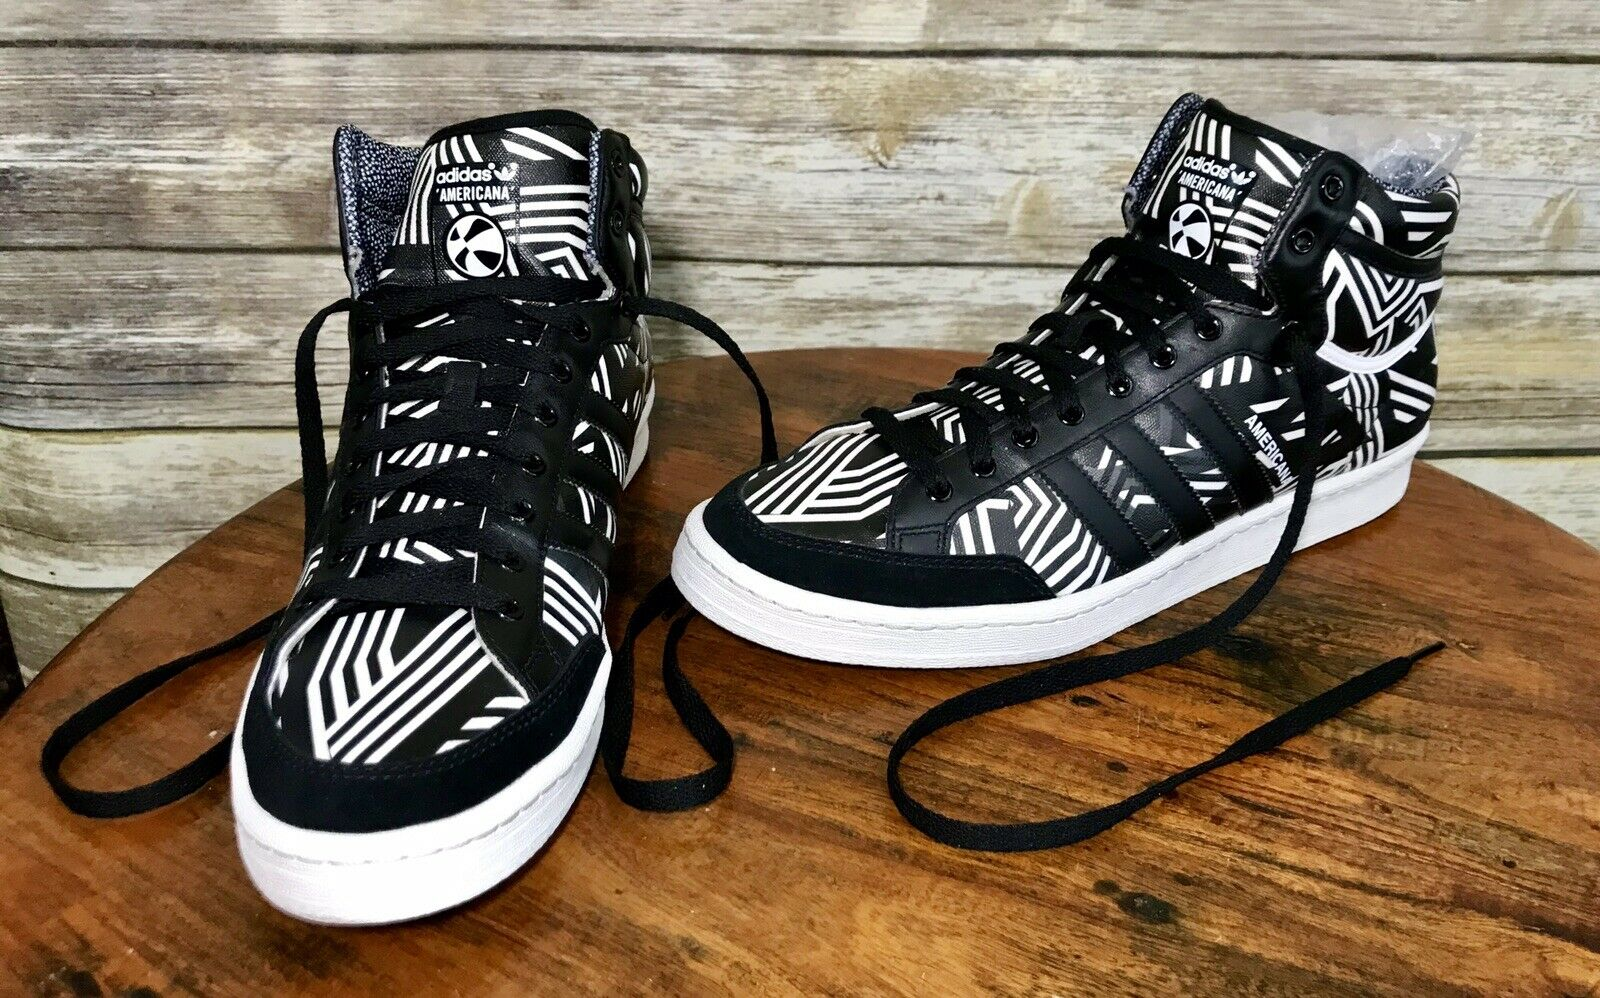 Adidas Originals Americana Hi 88 Sz 12 High Top Sneakers Black White RARE D65683